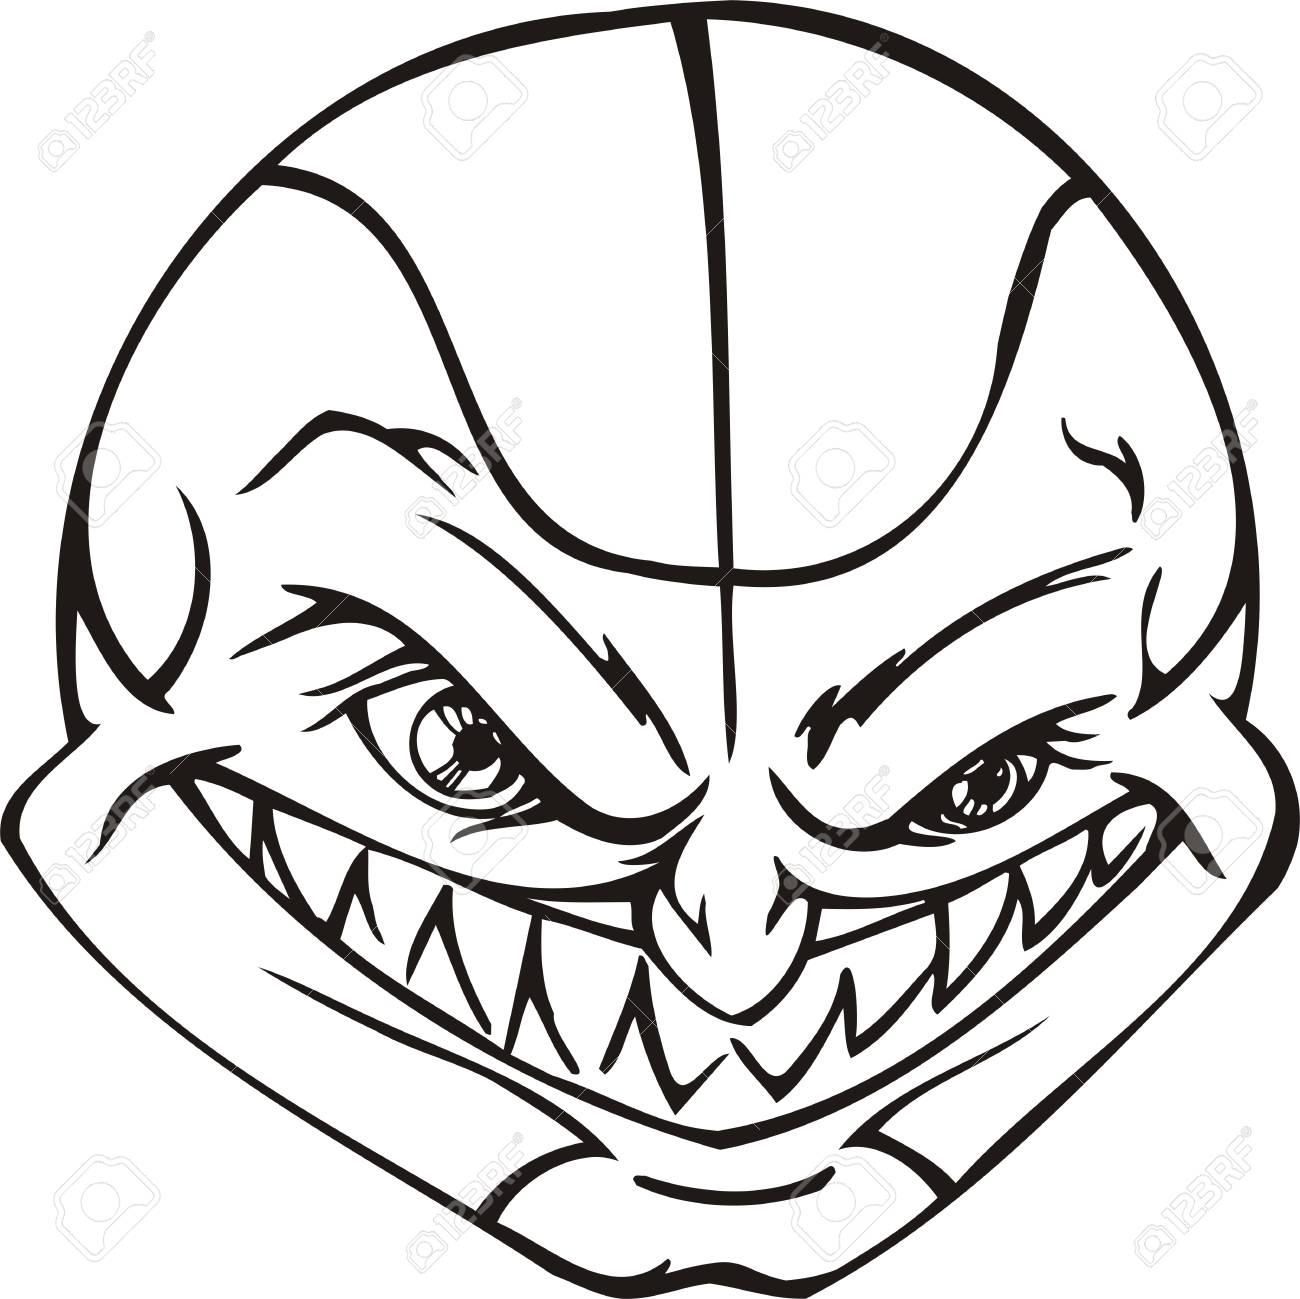 Mask Ball.Mascot Templates.Vector illustration ready for vinyl cutting. Stock Vector - 8594733